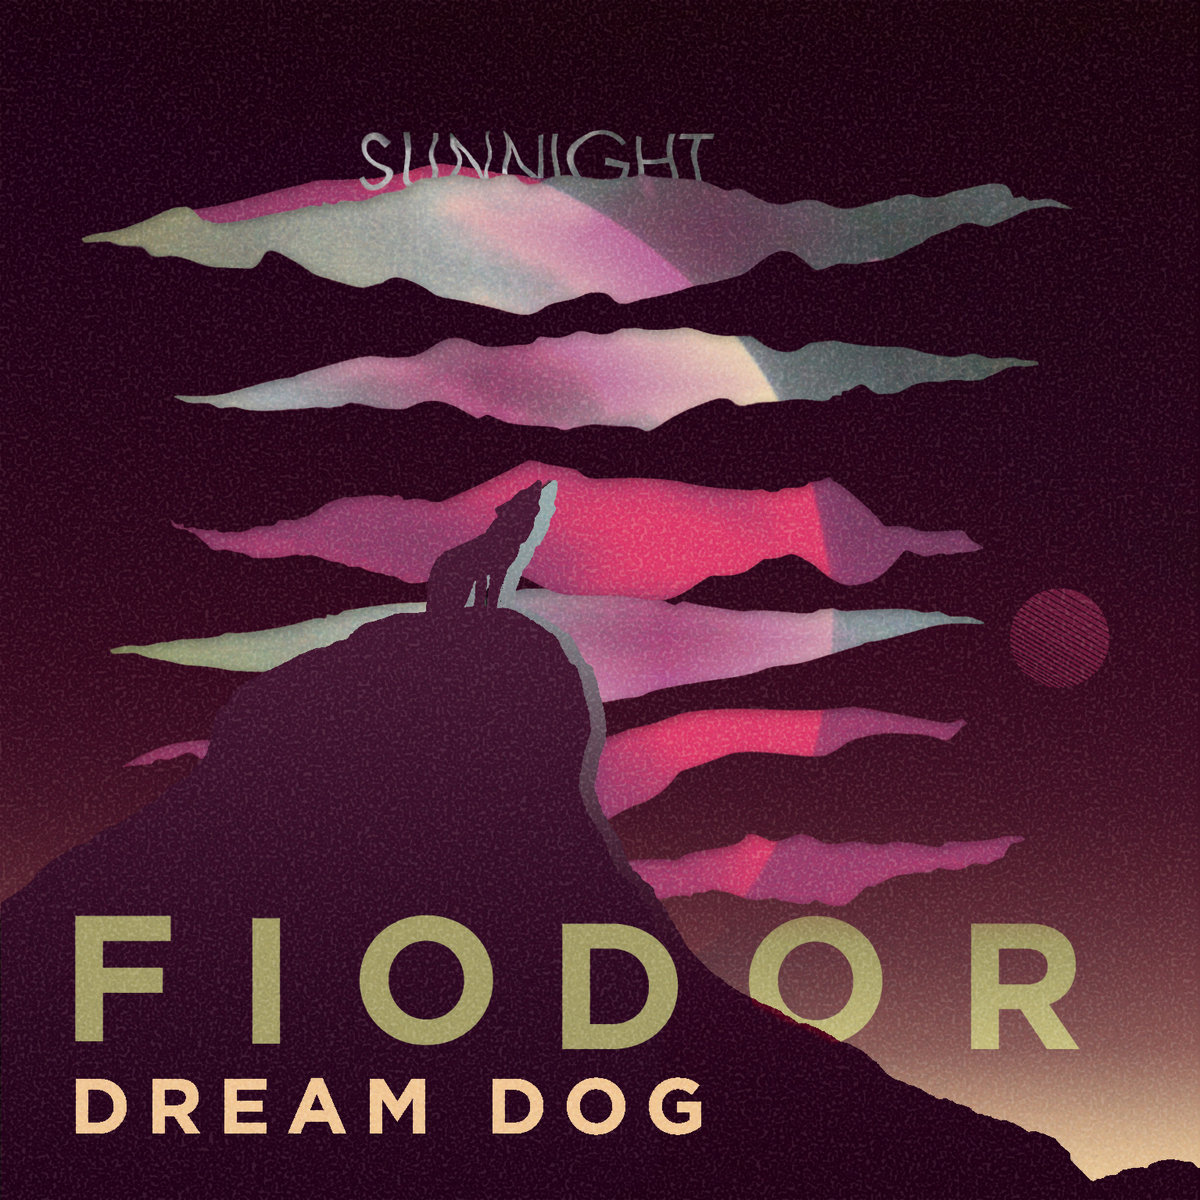 Sunnight | Fiodor Dream Dog